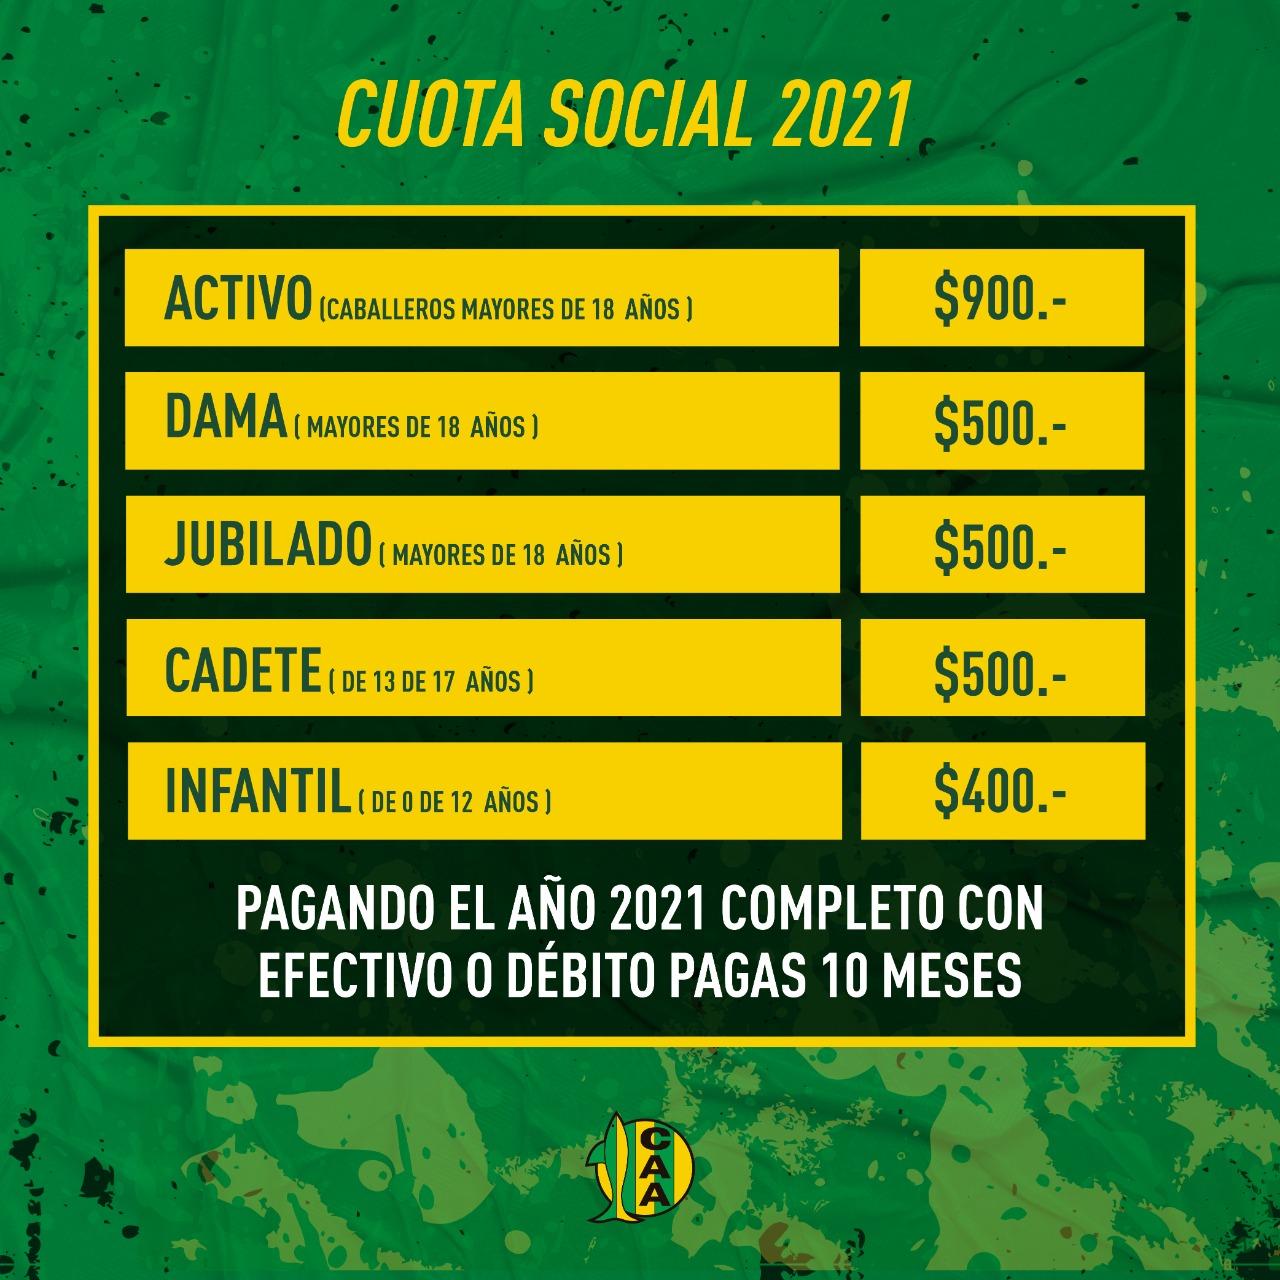 Valores de la cuota social 2021